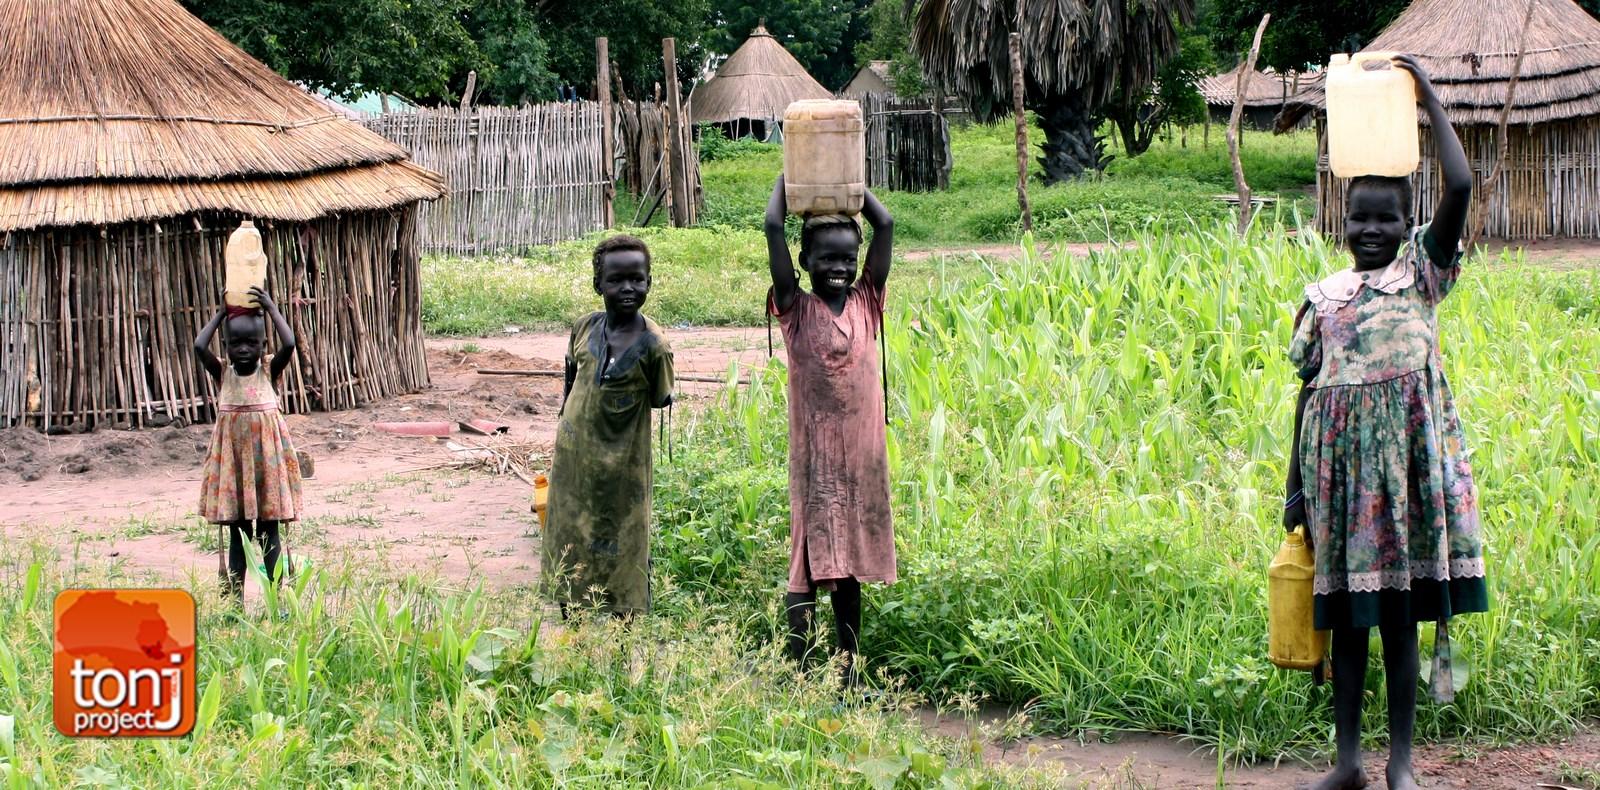 Raccolta acqua Tonj sud sudan Tonjproject Onlus